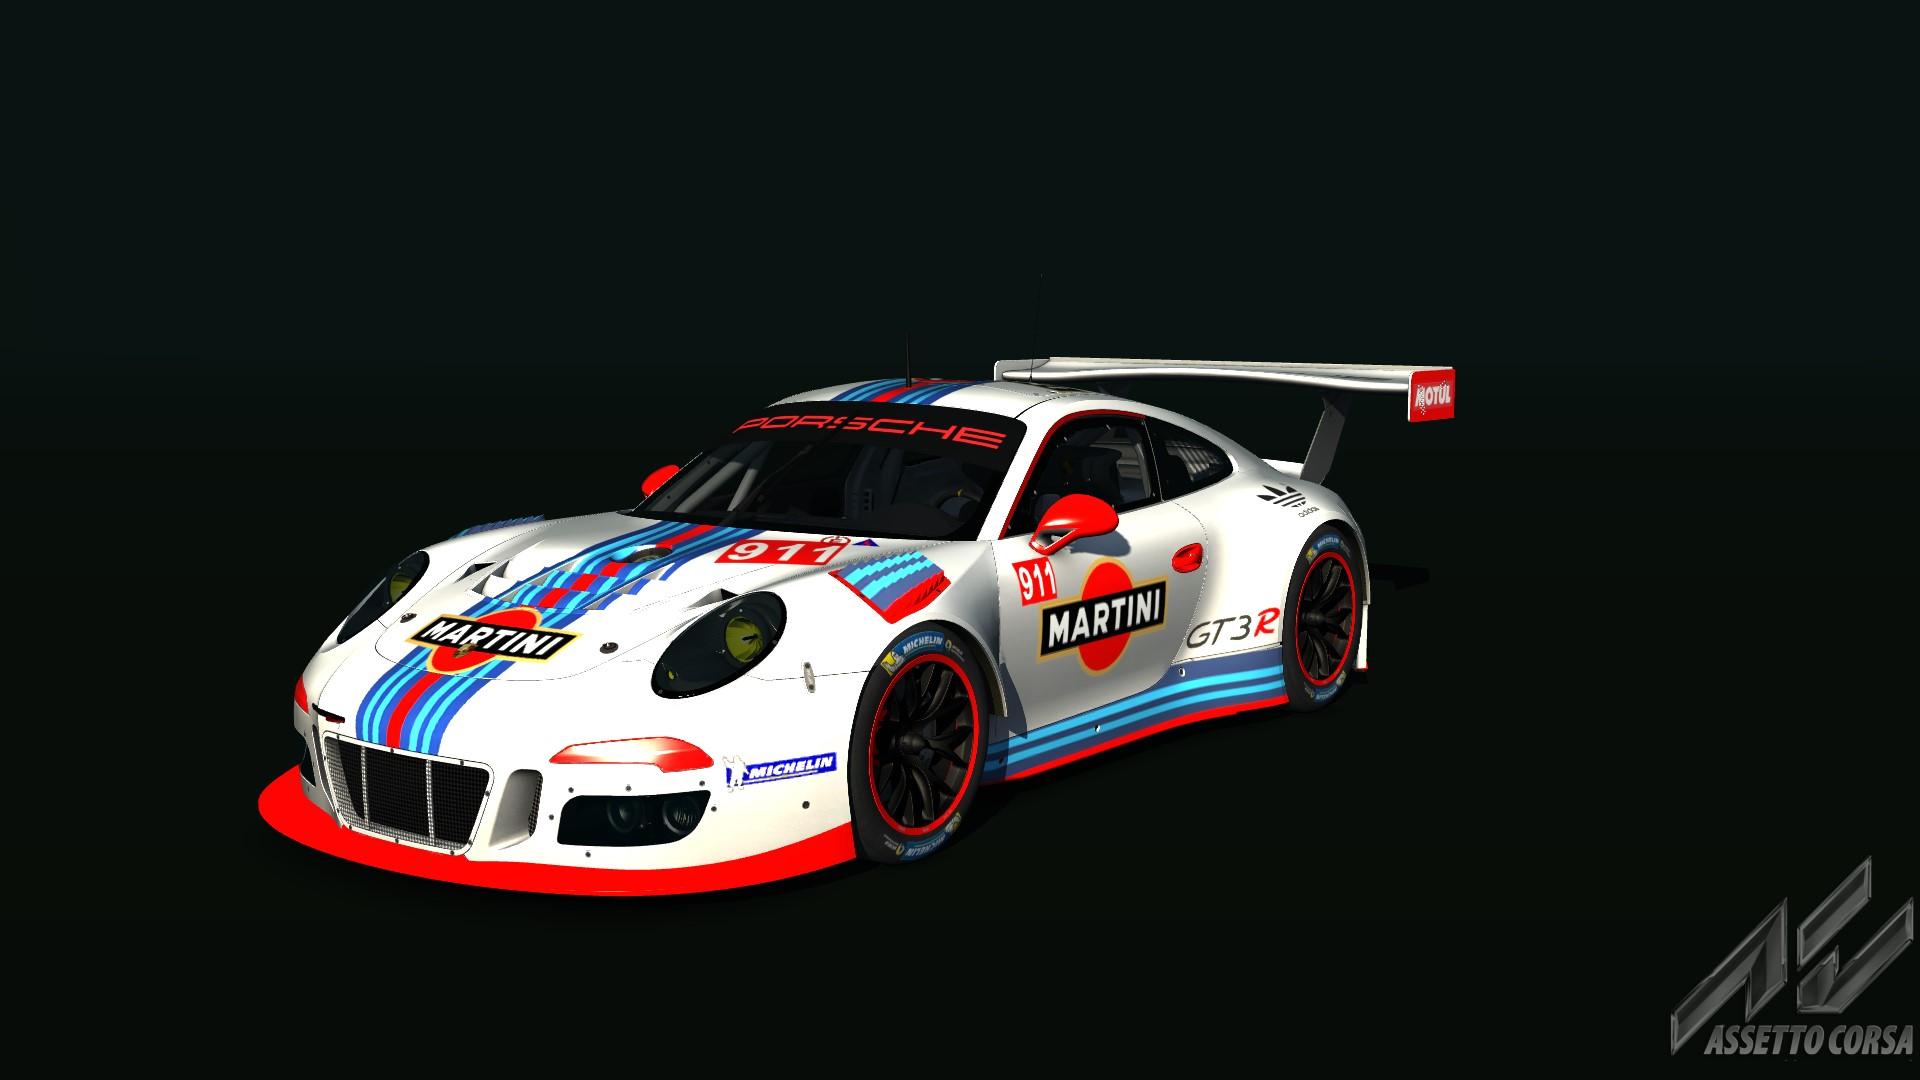 Porsche 911 Gt3 R 2016 Martini Updates Racedepartment